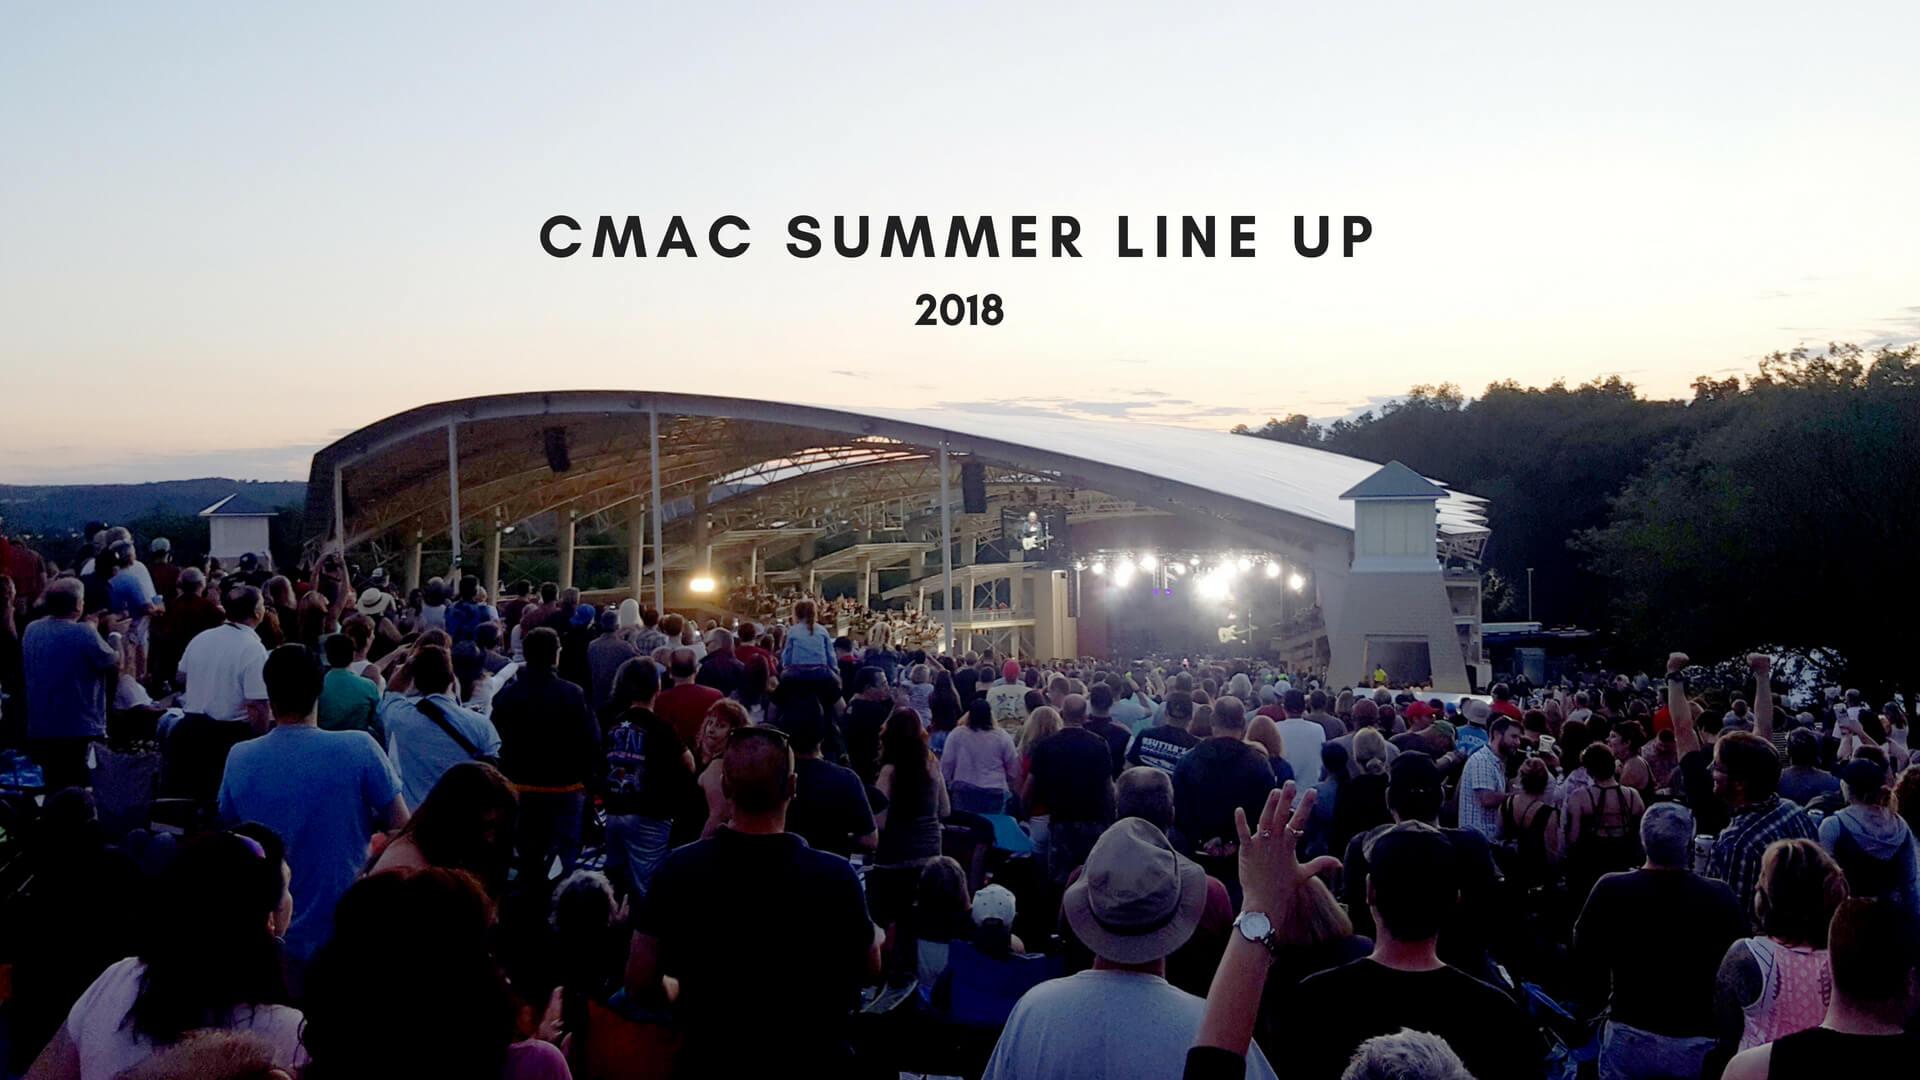 2018 CMAC Summer Line Up